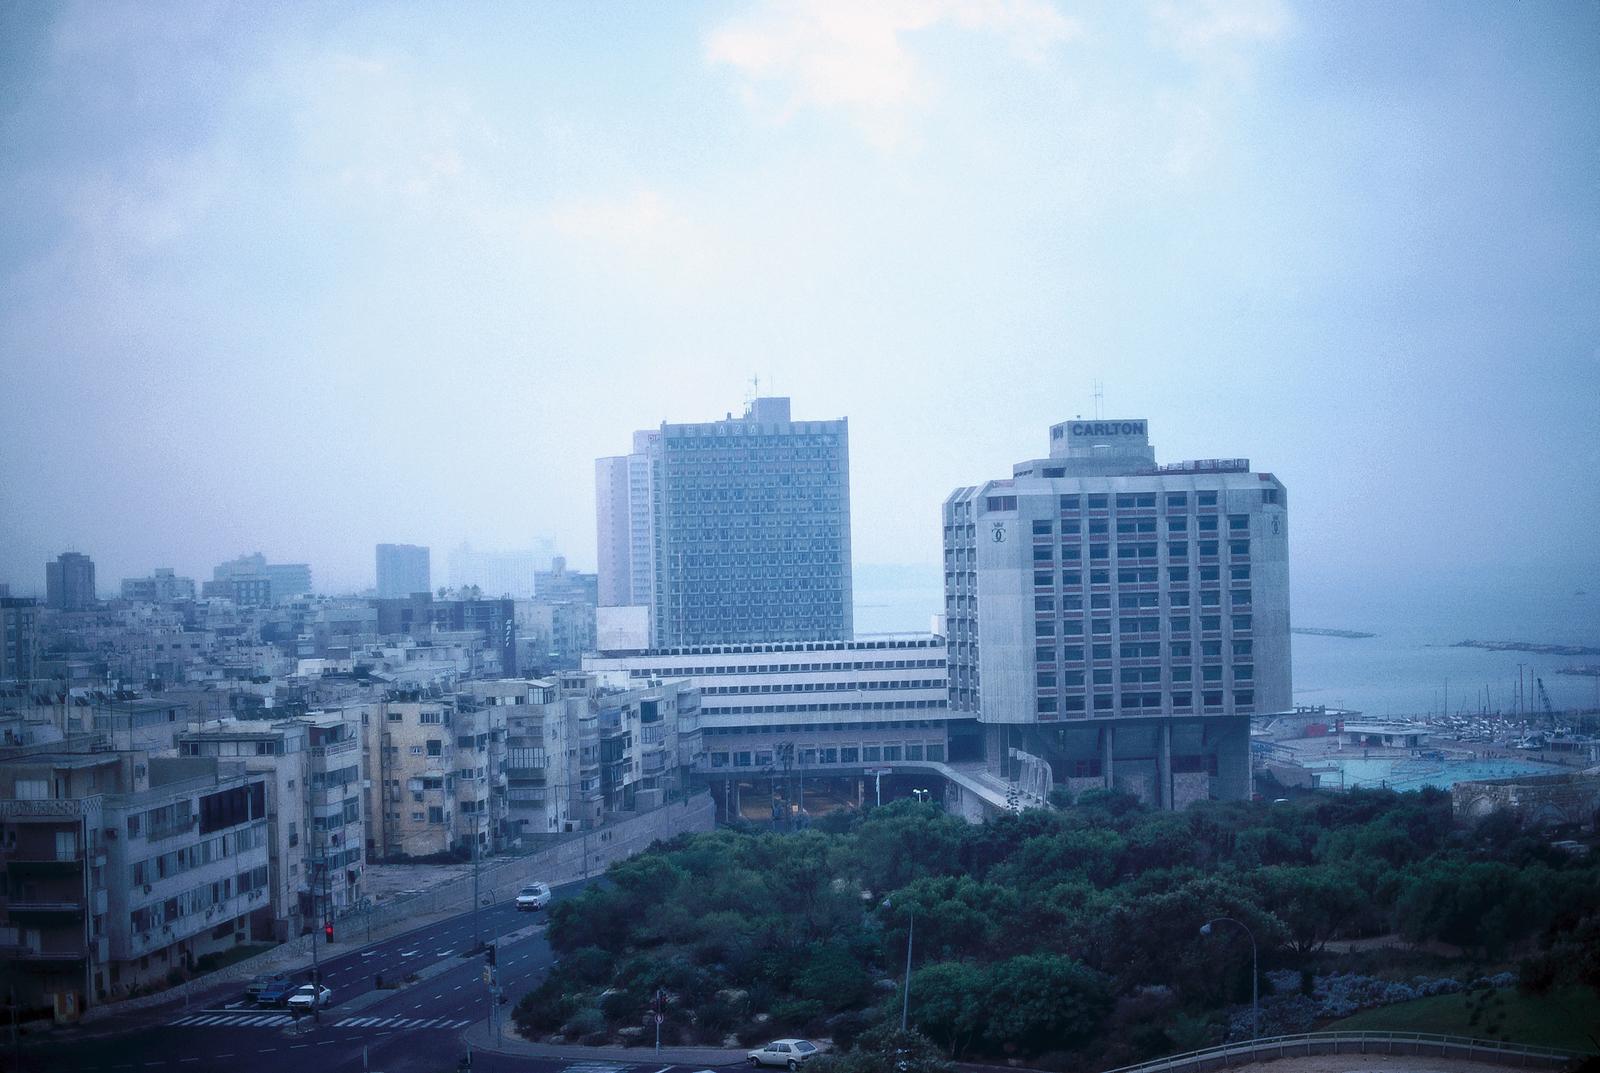 Tel Aviv - Chancery Office Building - 1981